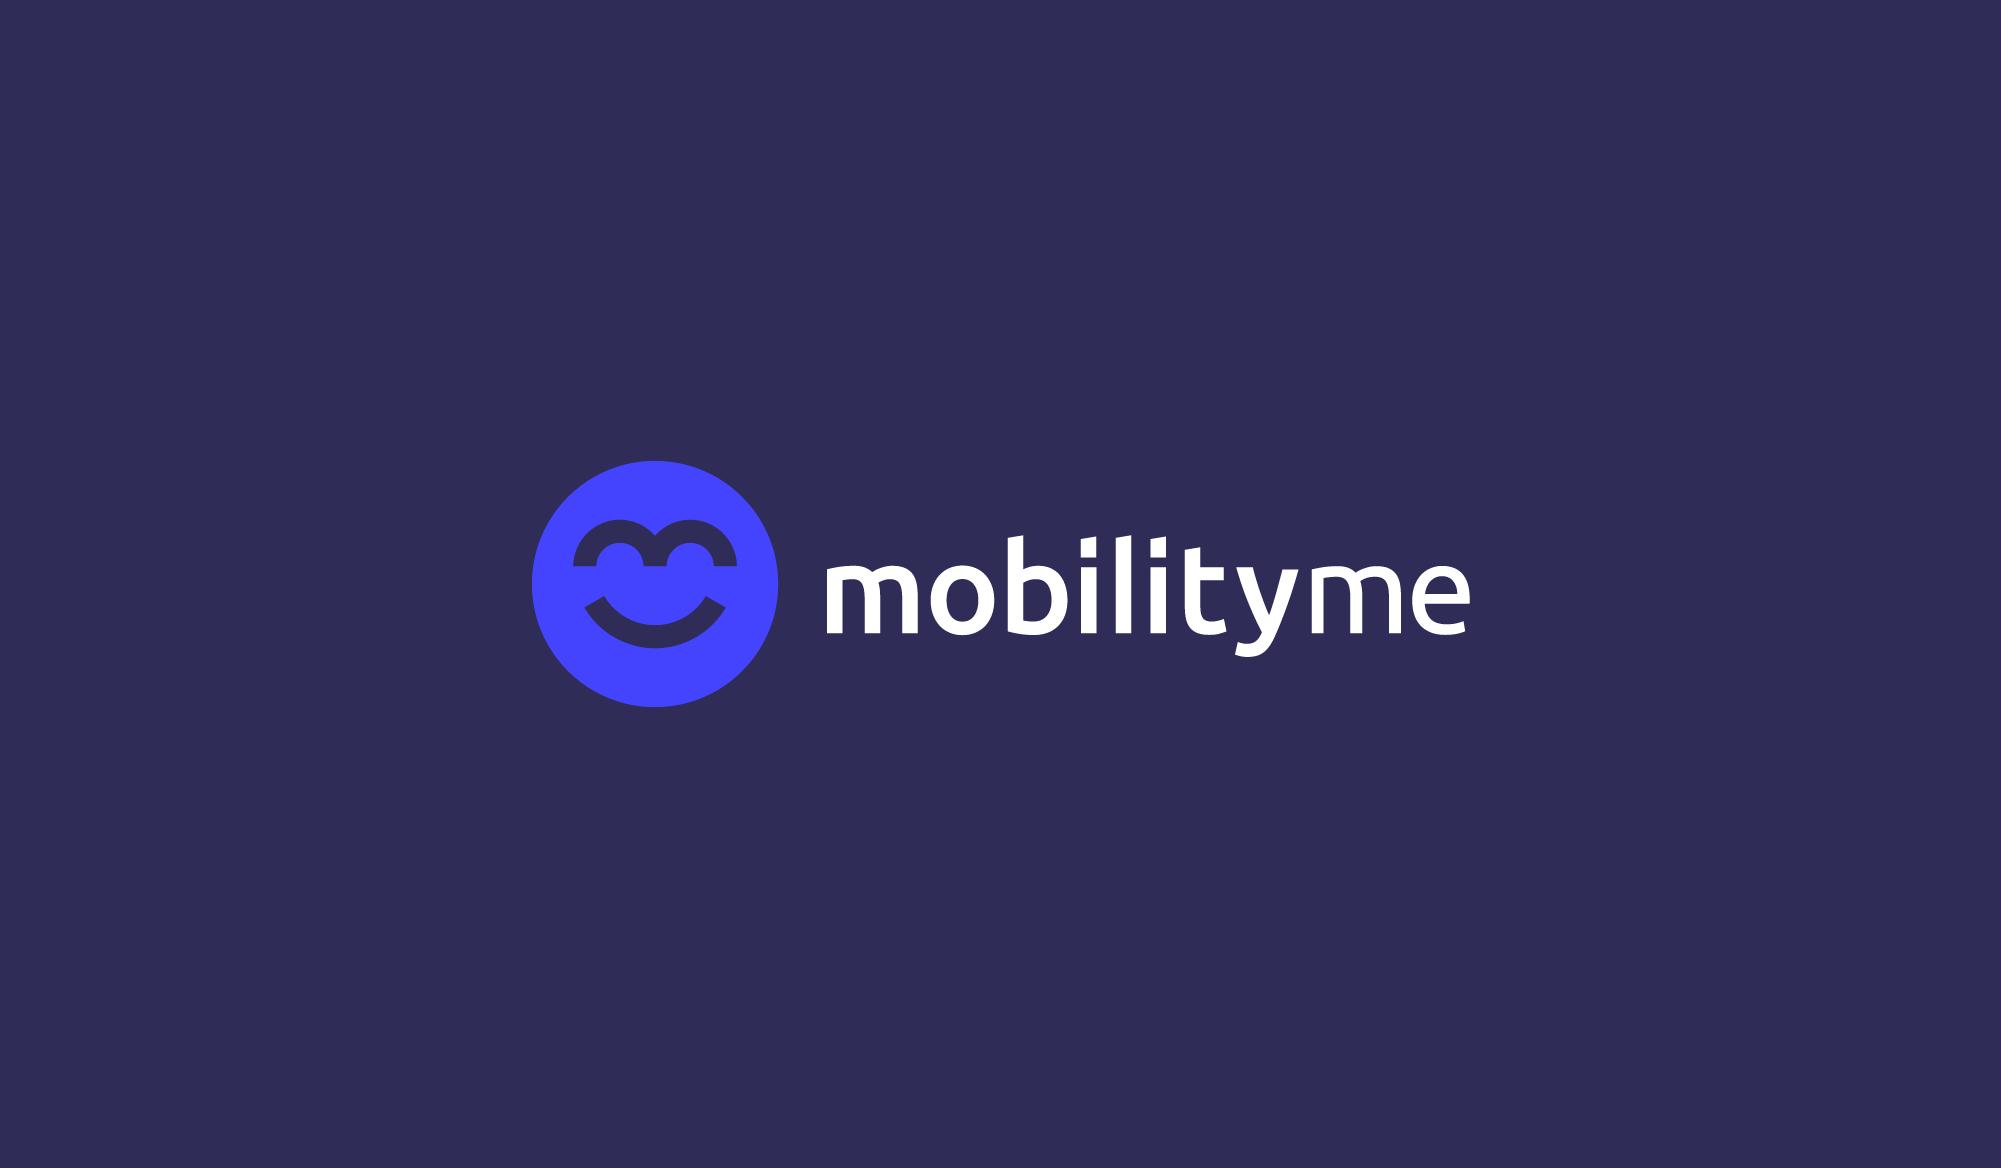 sb-logo-mobilityme-06